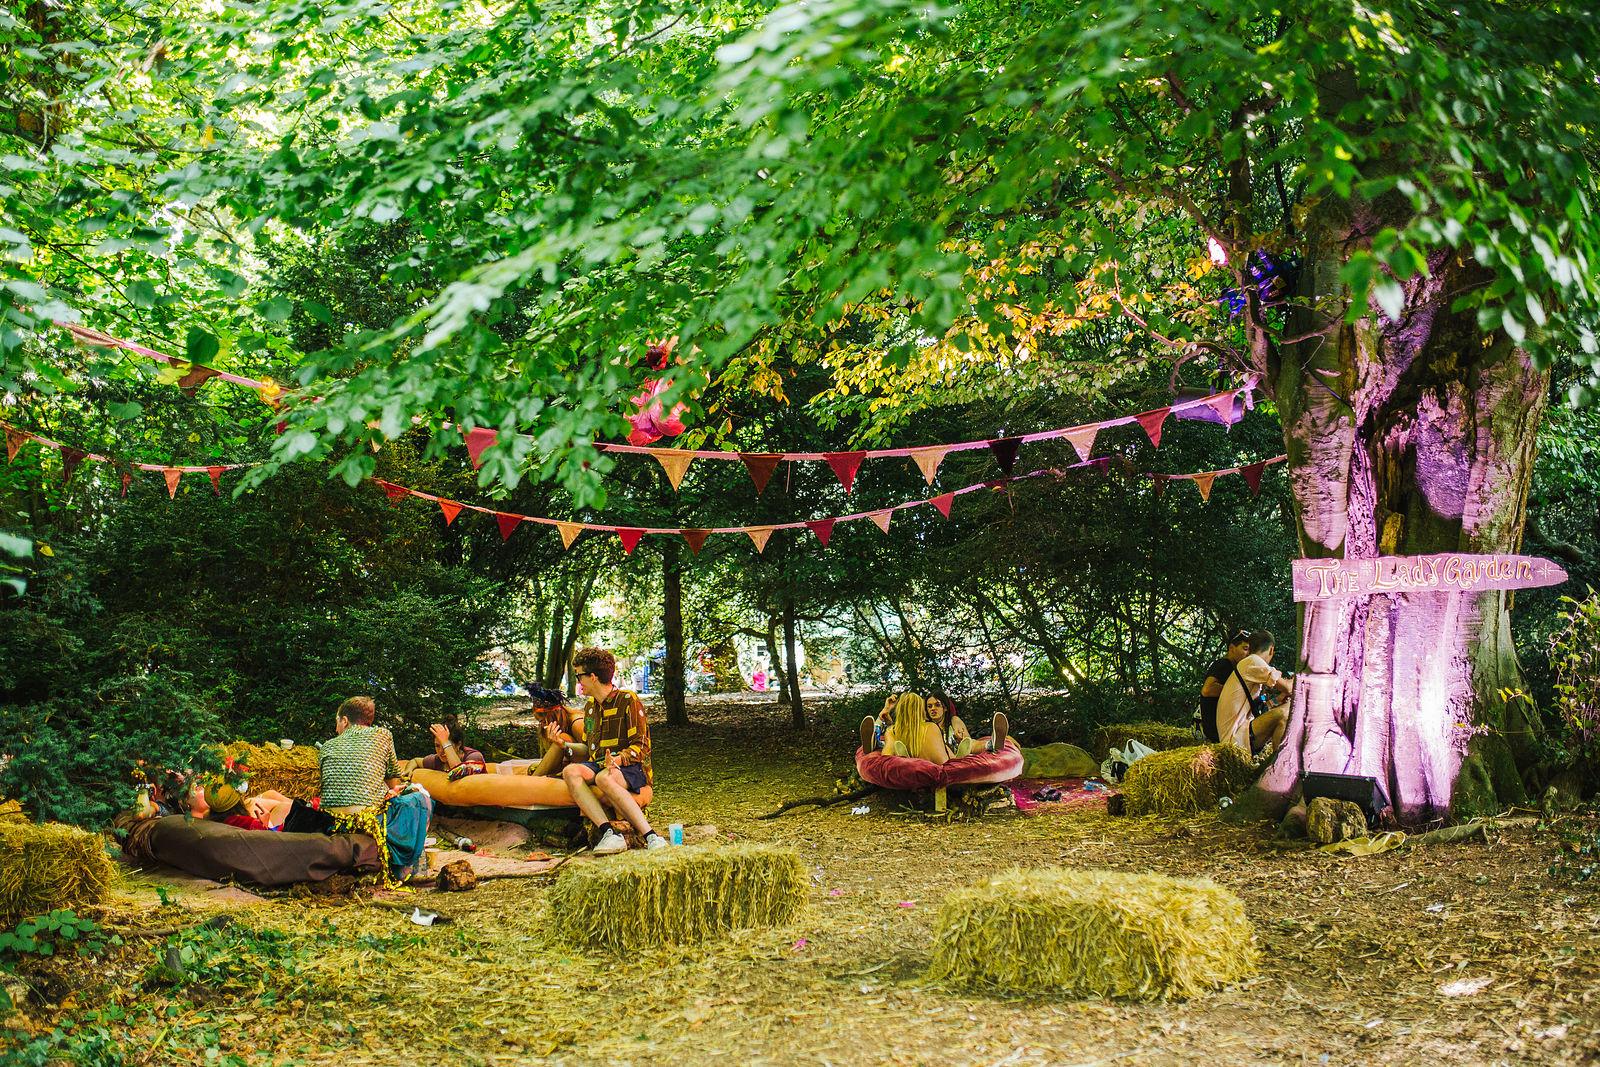 The Lady Garden